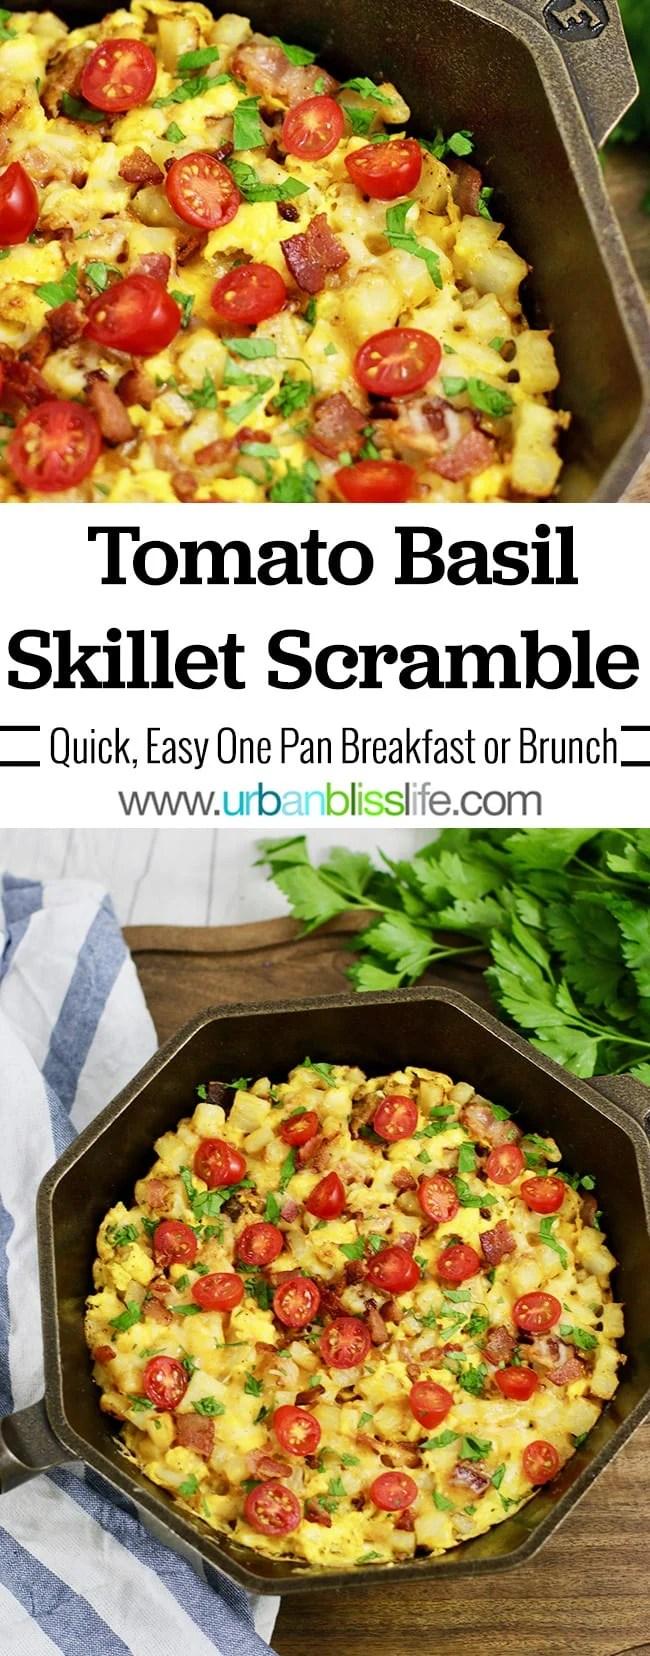 Tomato Basil Skillet Scramble